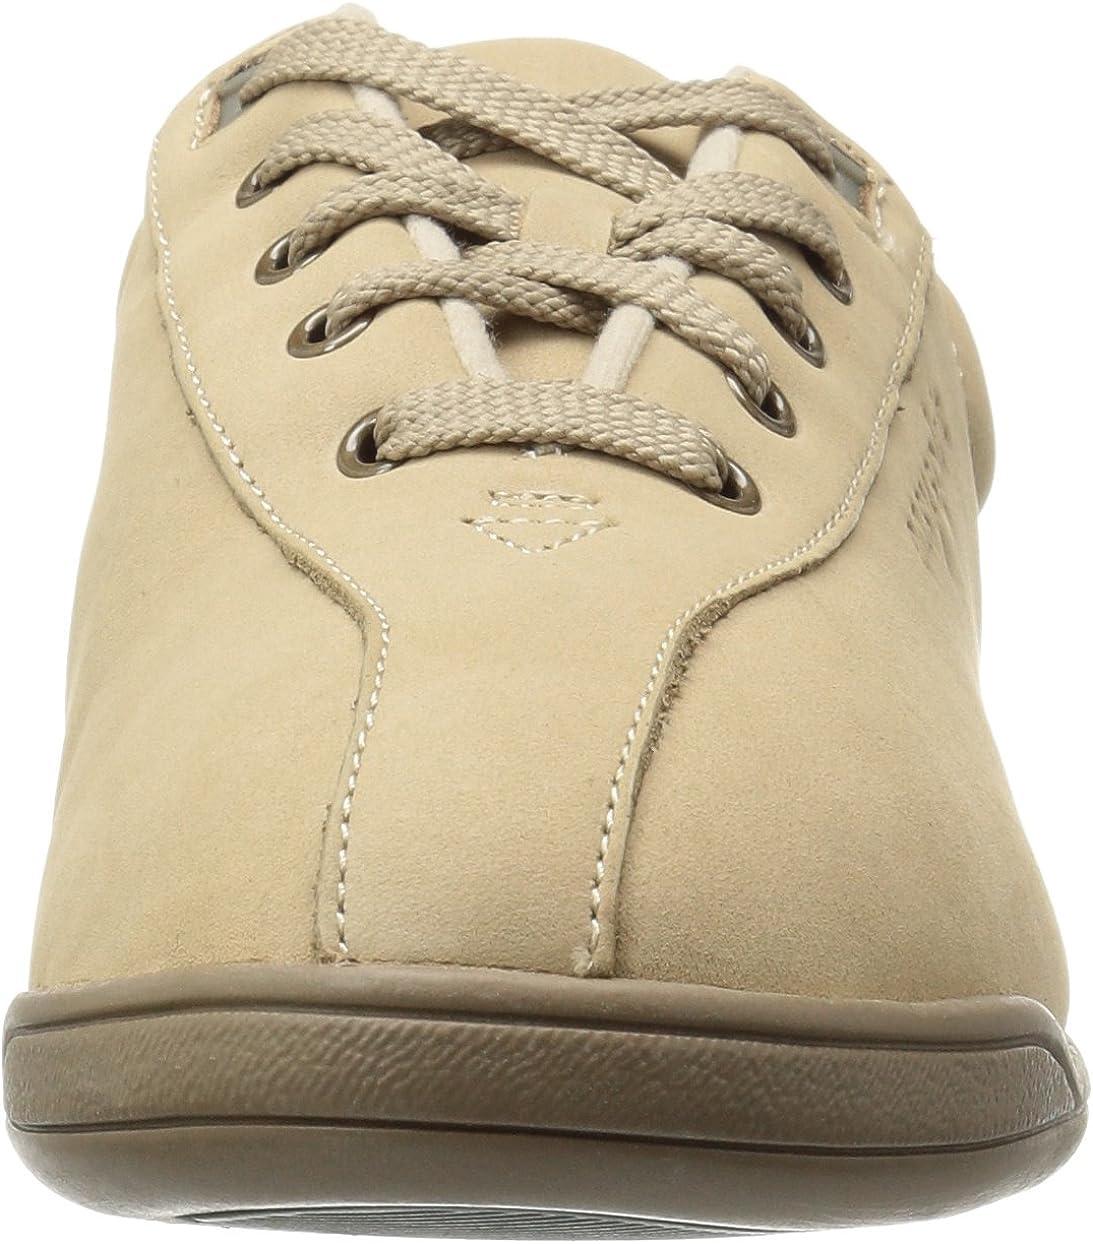 Easy Spirit AP1 Sport Walking Shoe Tan Nubuck